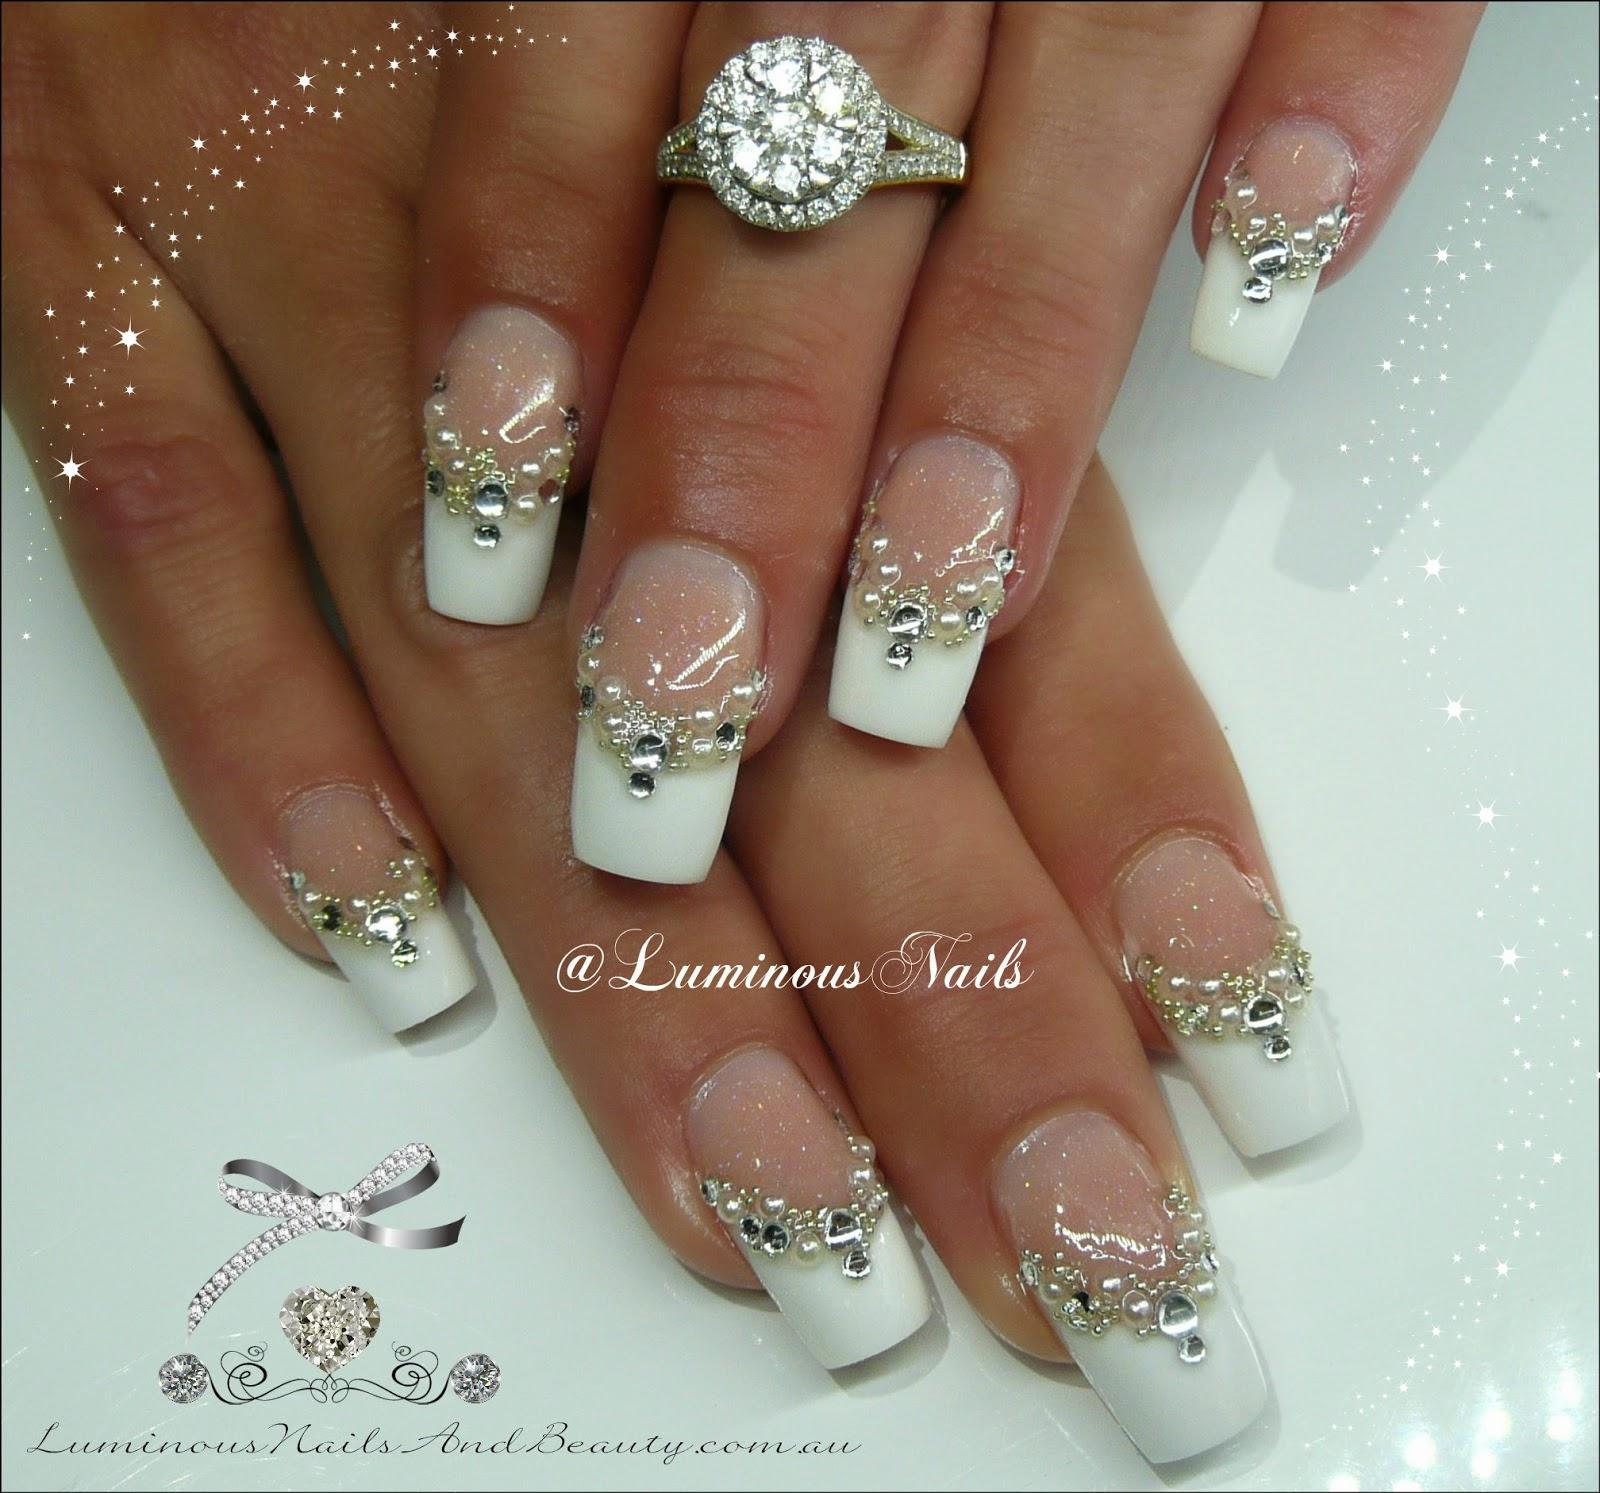 Acrylic Nail Designs For A Wedding: Wedding nails design ideas with ...